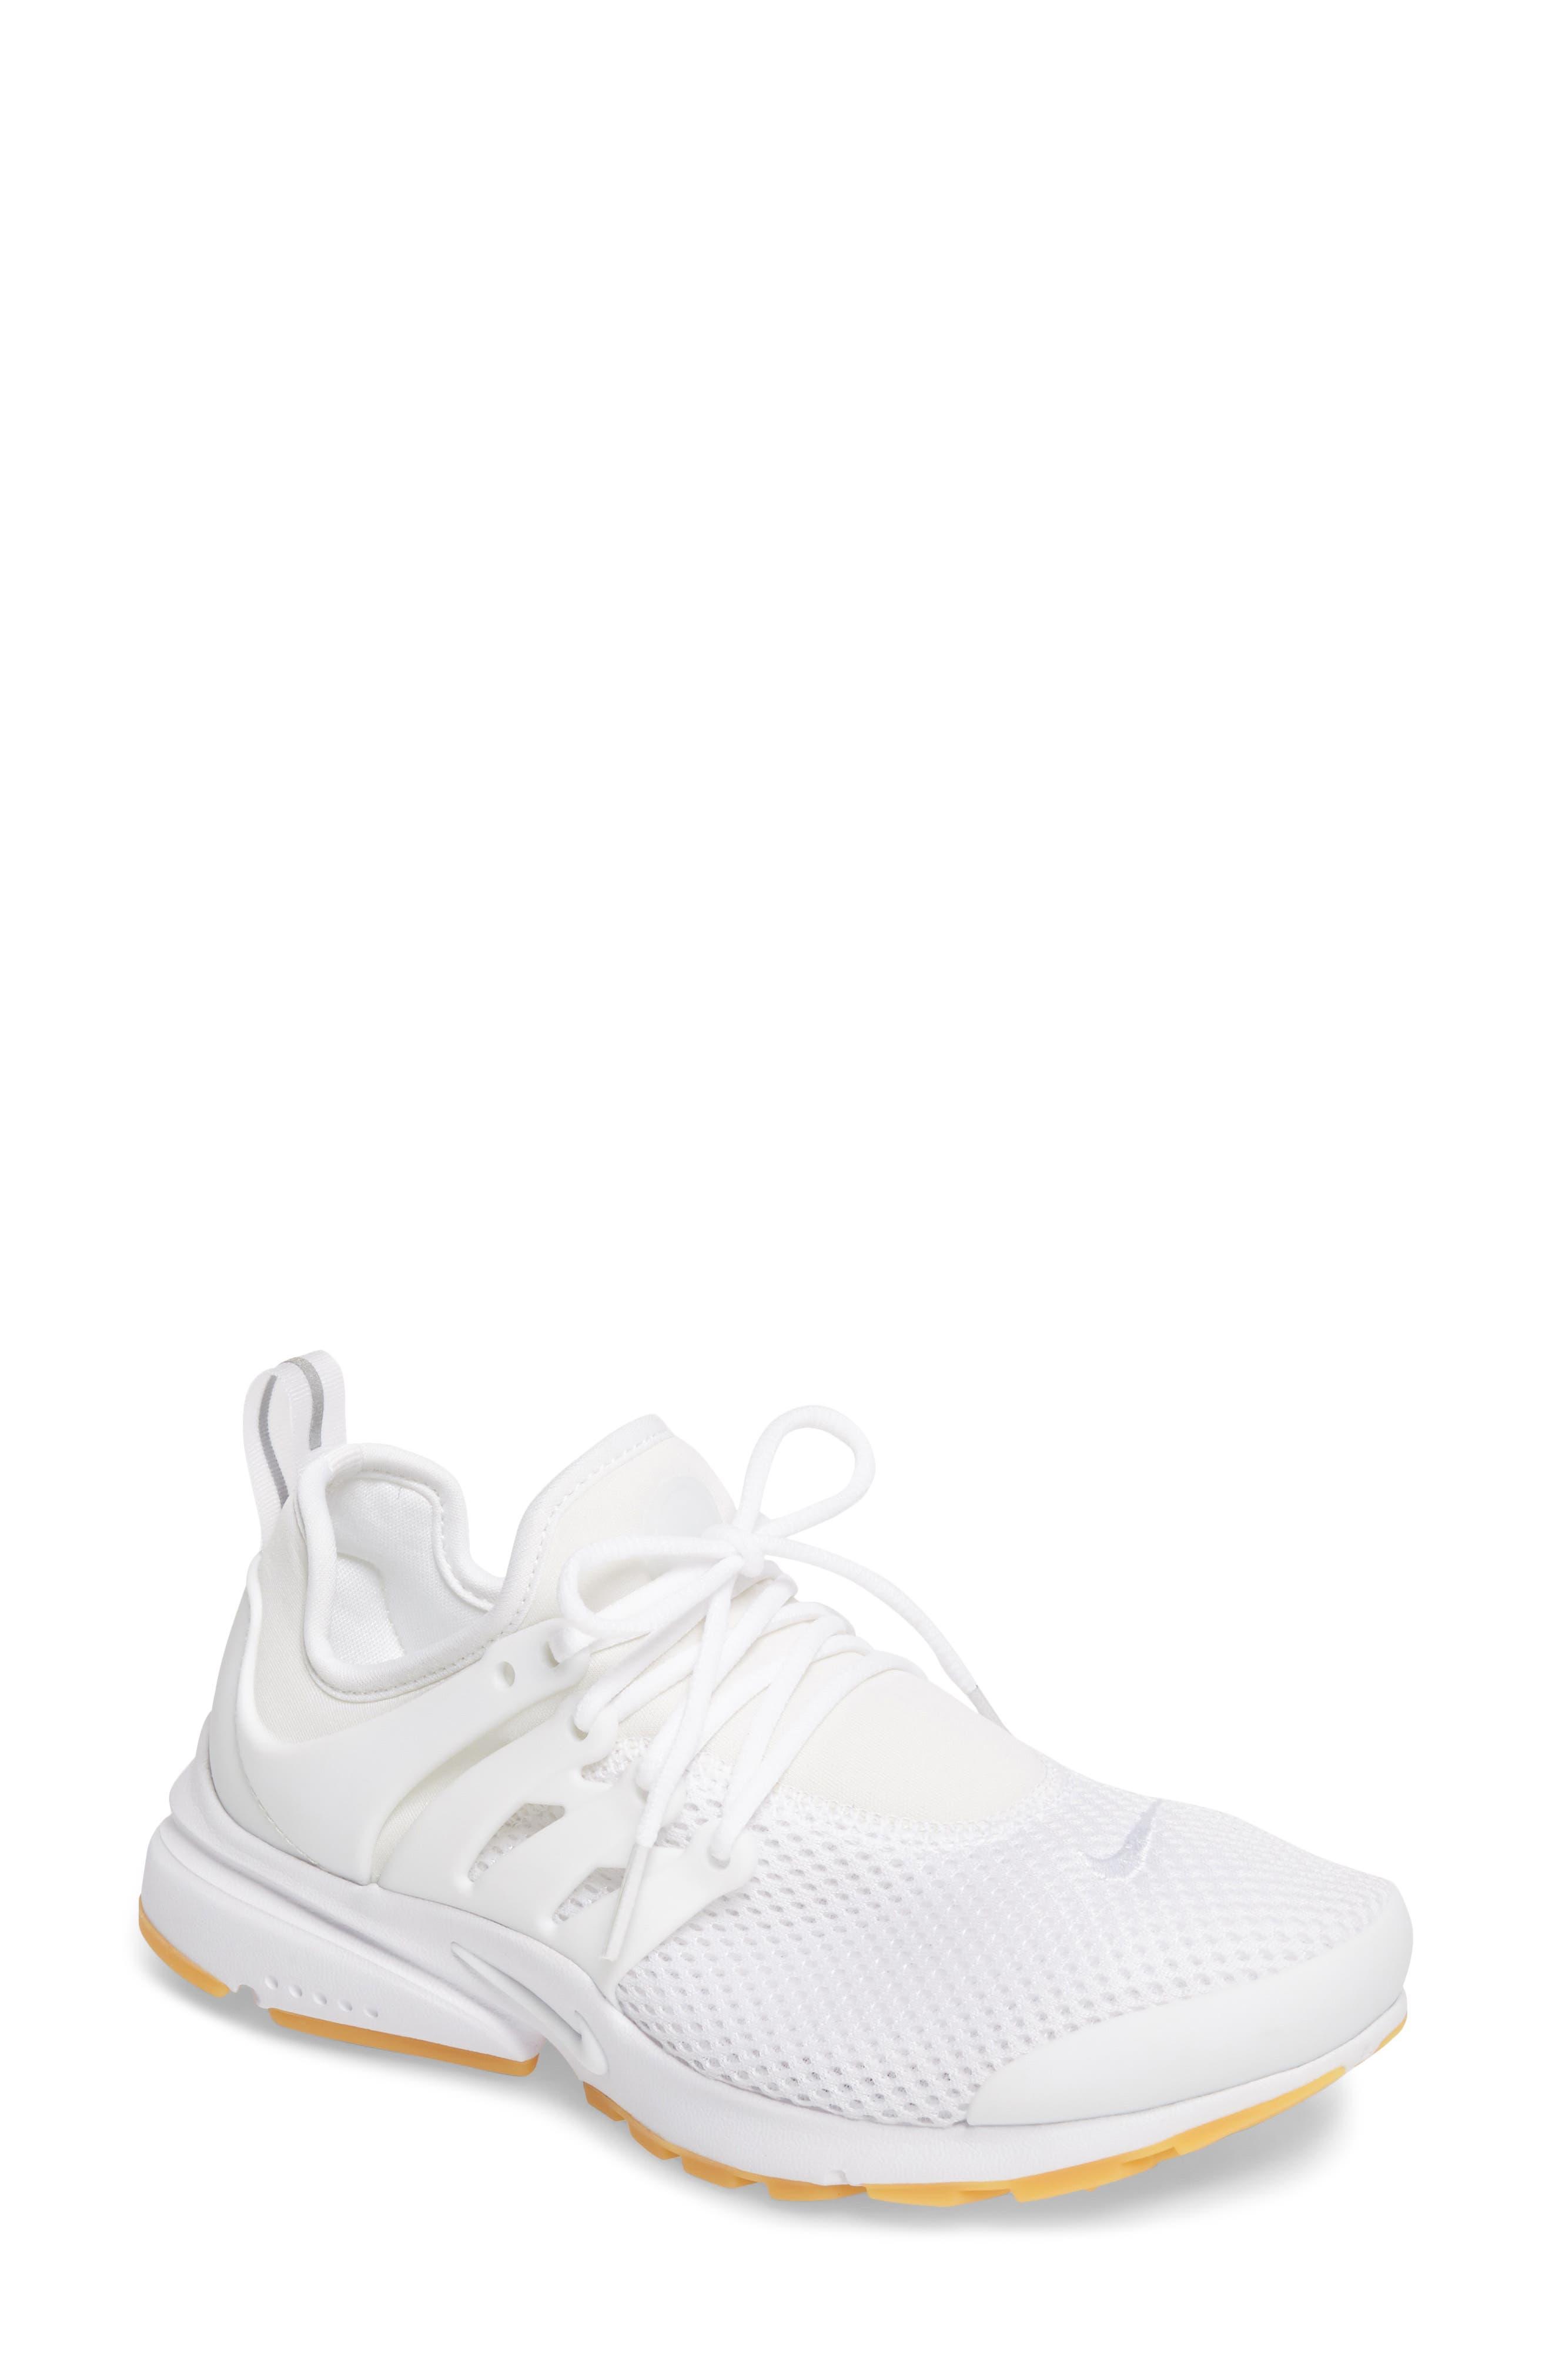 Air Presto Flyknit Ultra Sneaker,                             Main thumbnail 1, color,                             White/ Gum Yellow/ Wolf Grey